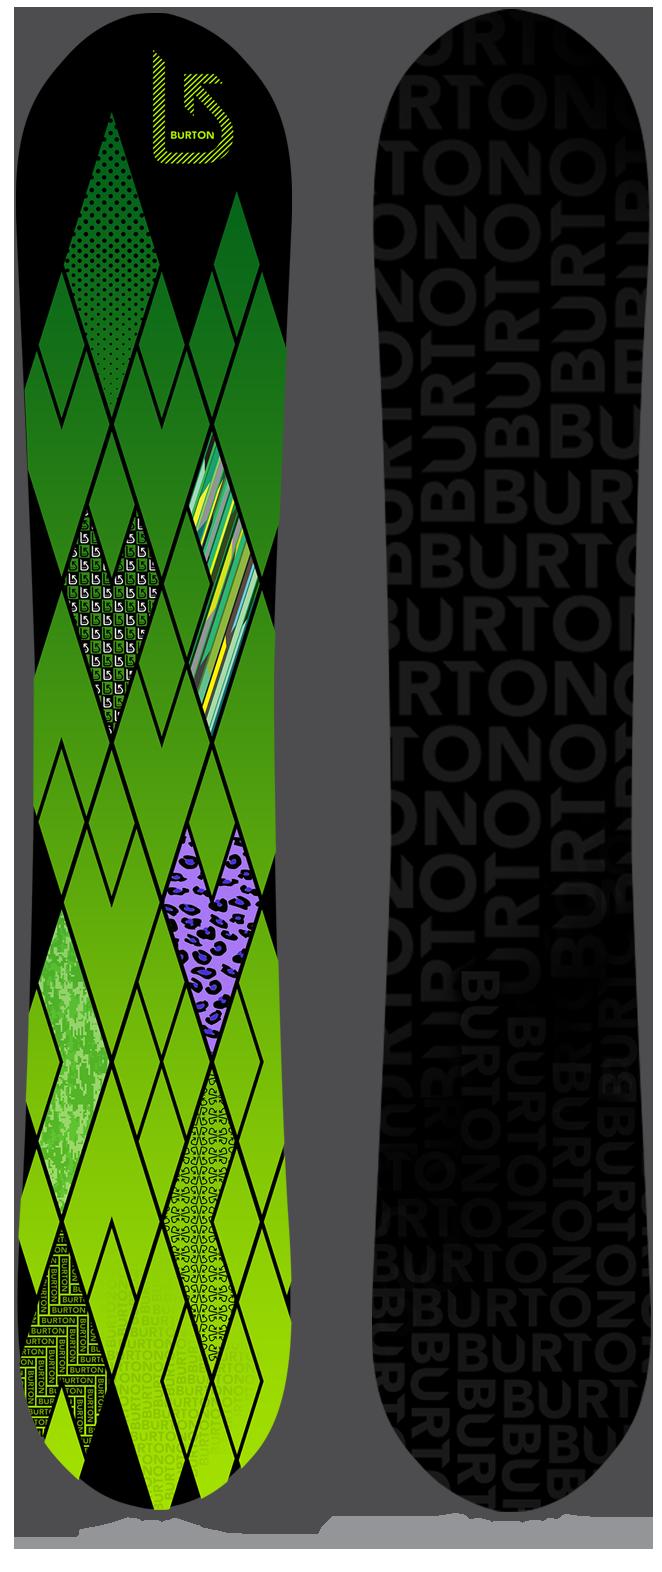 Burton Tattletale snowboard design proposal